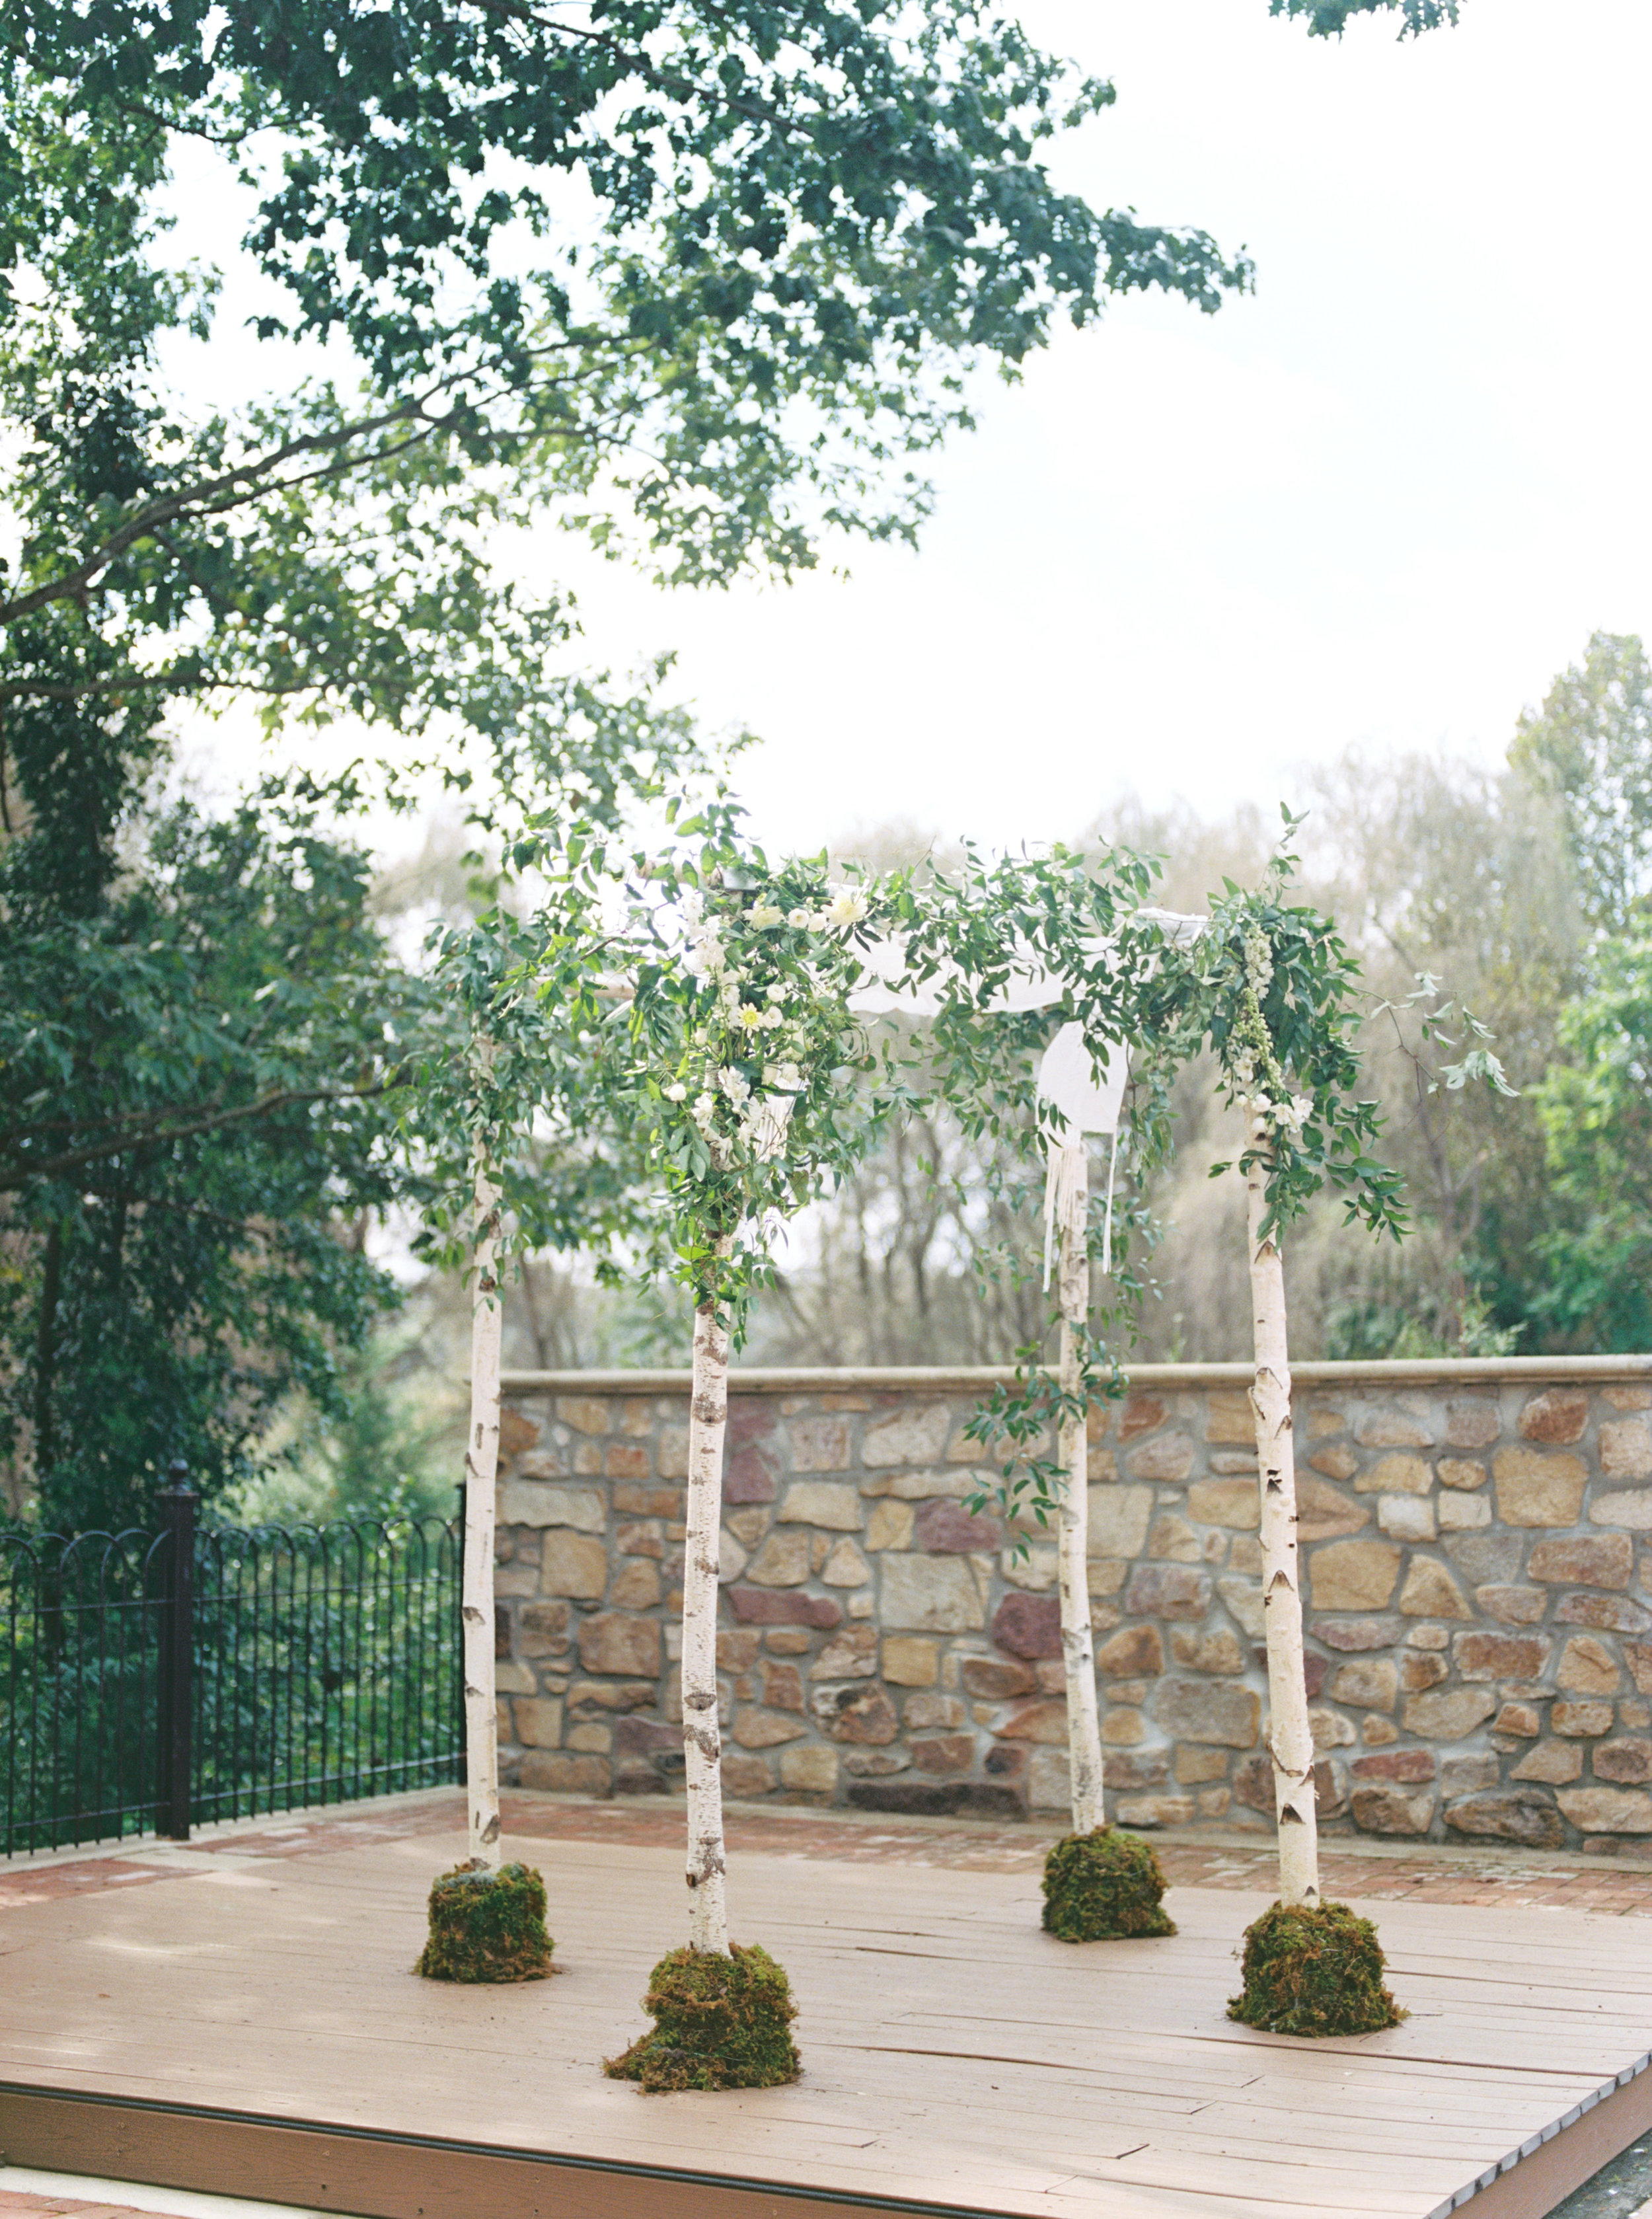 haley-richter-photography-october-hotel-du-village-wedding-103.jpg